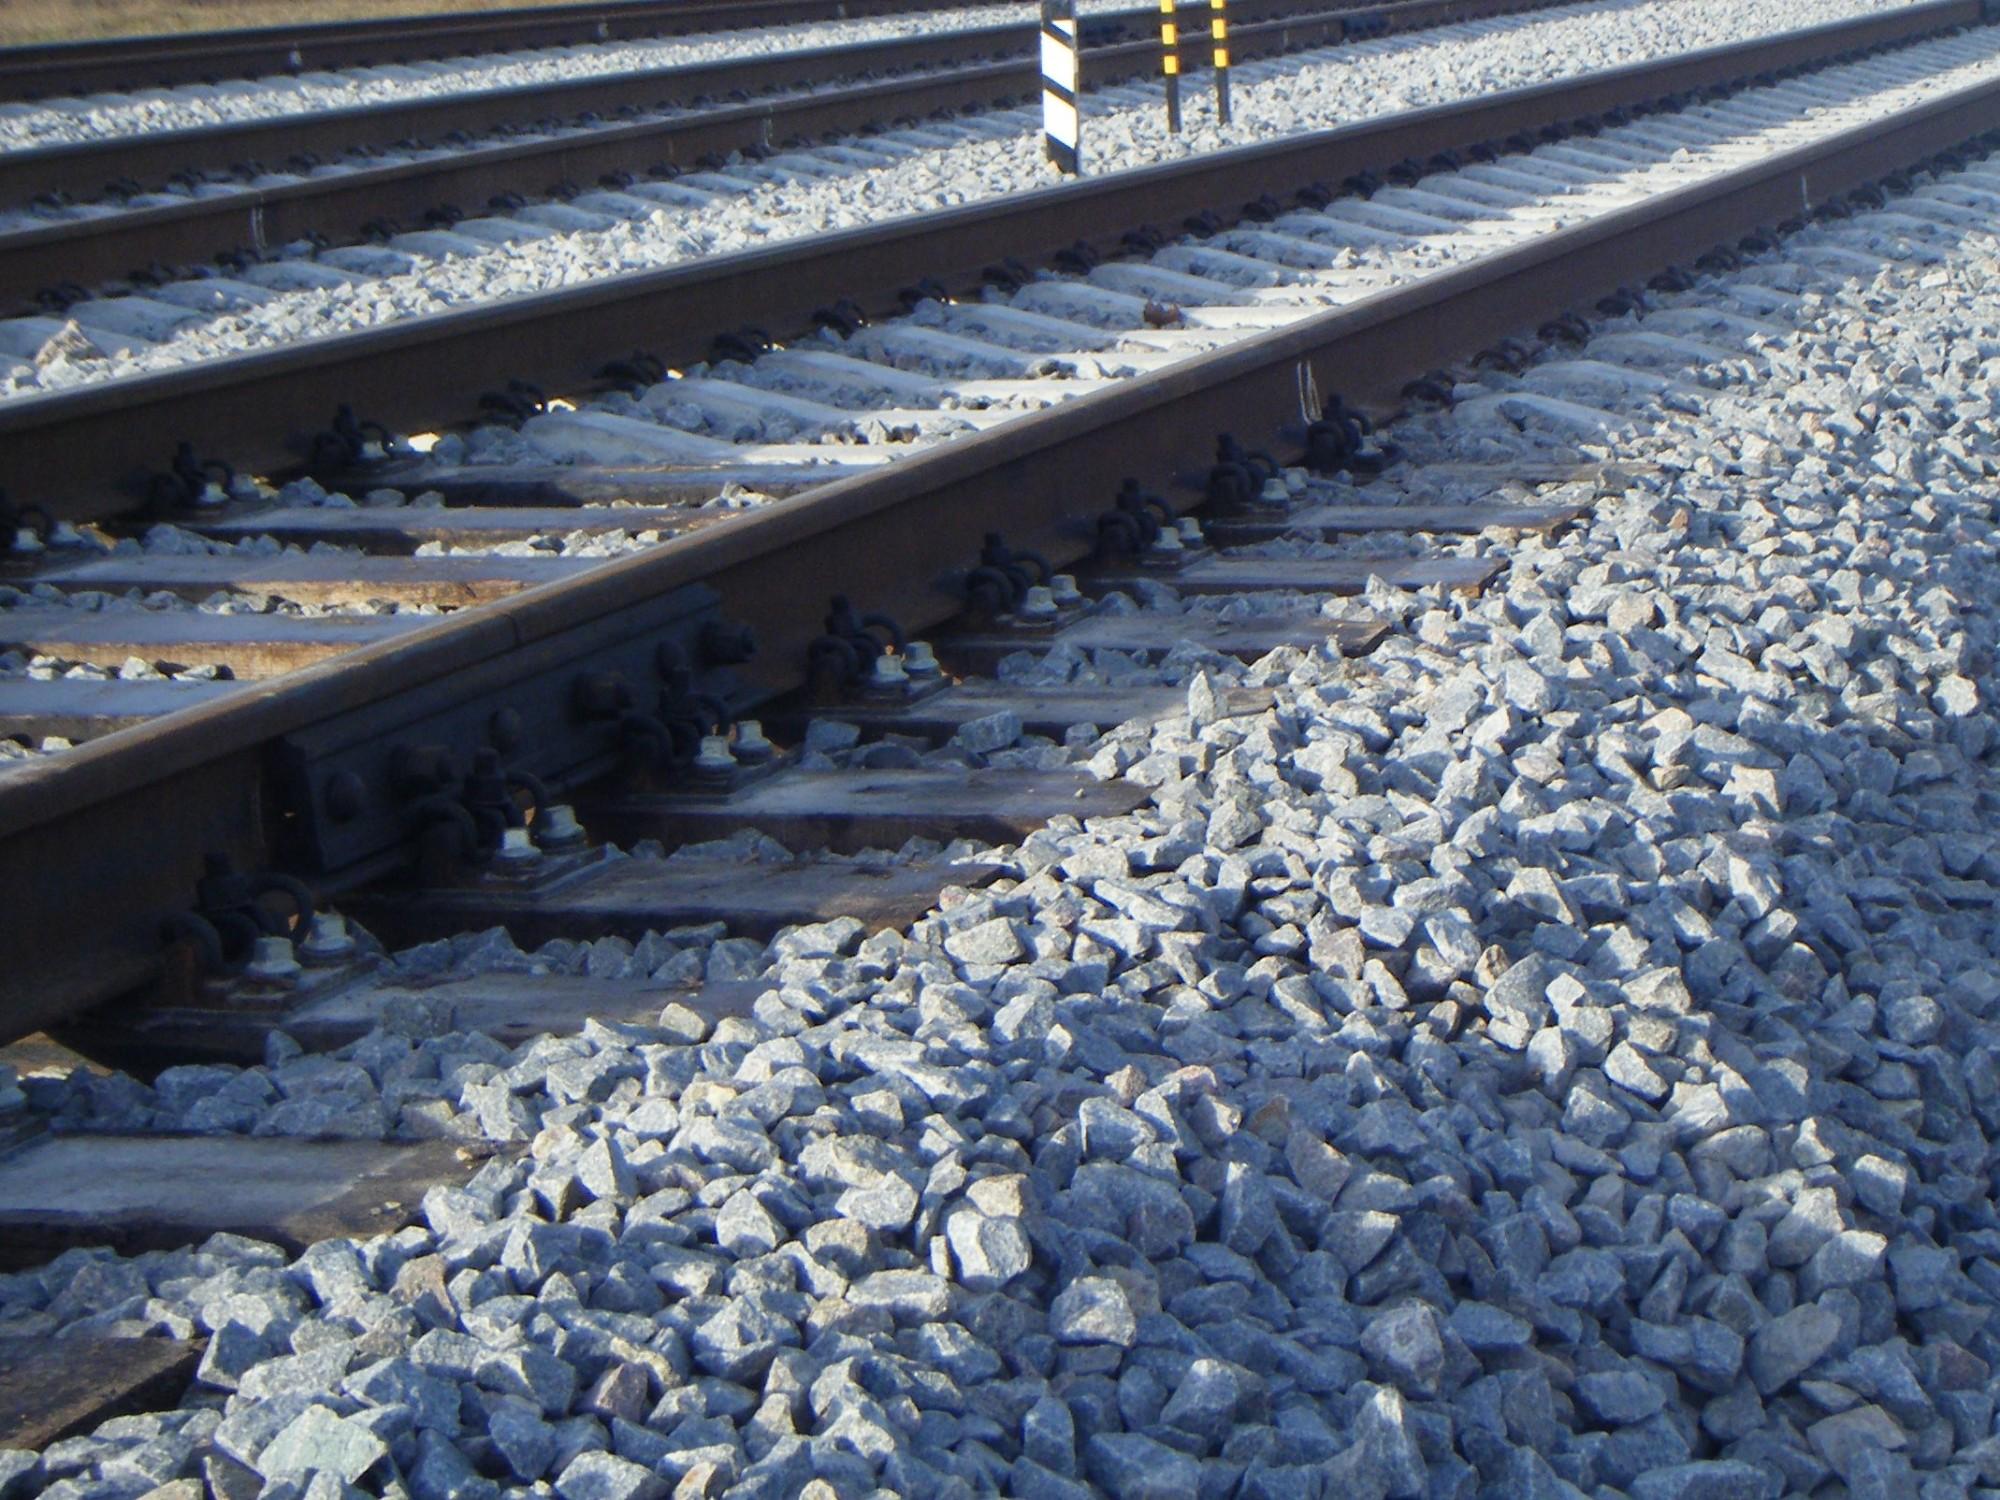 Apzog dzelzceļu